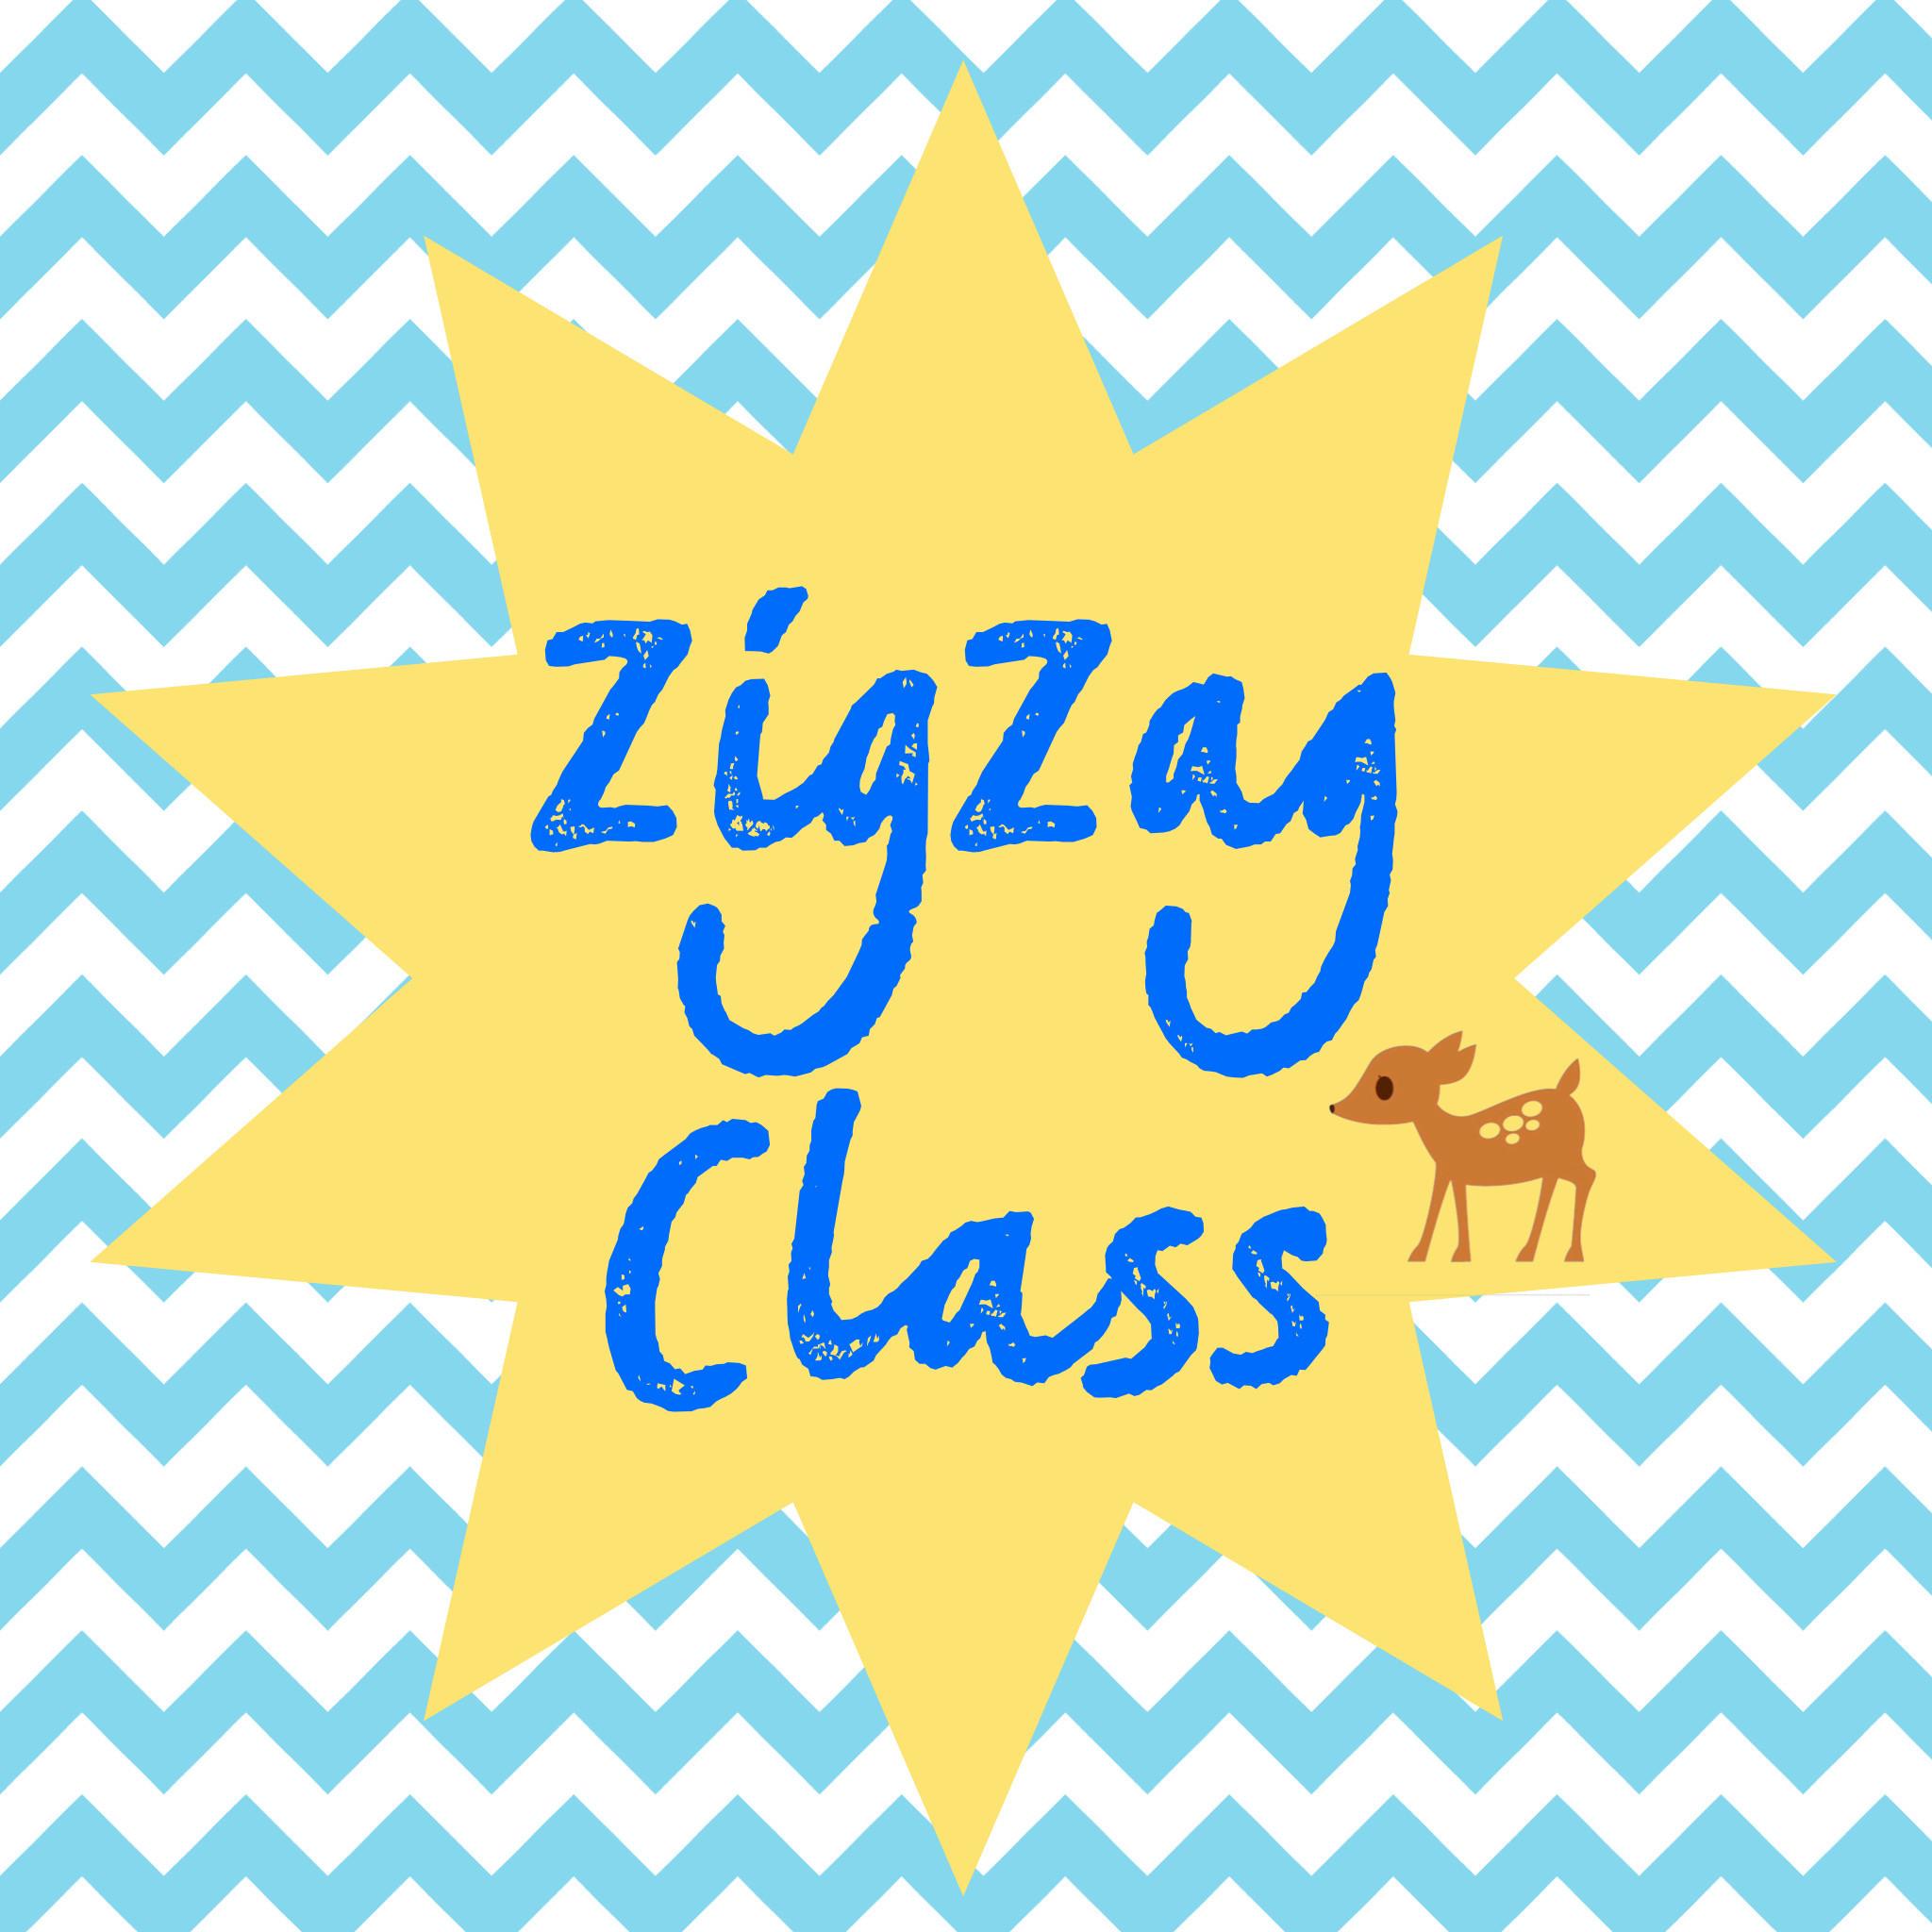 ZigZag Class Monday 10:45 Autumn Term